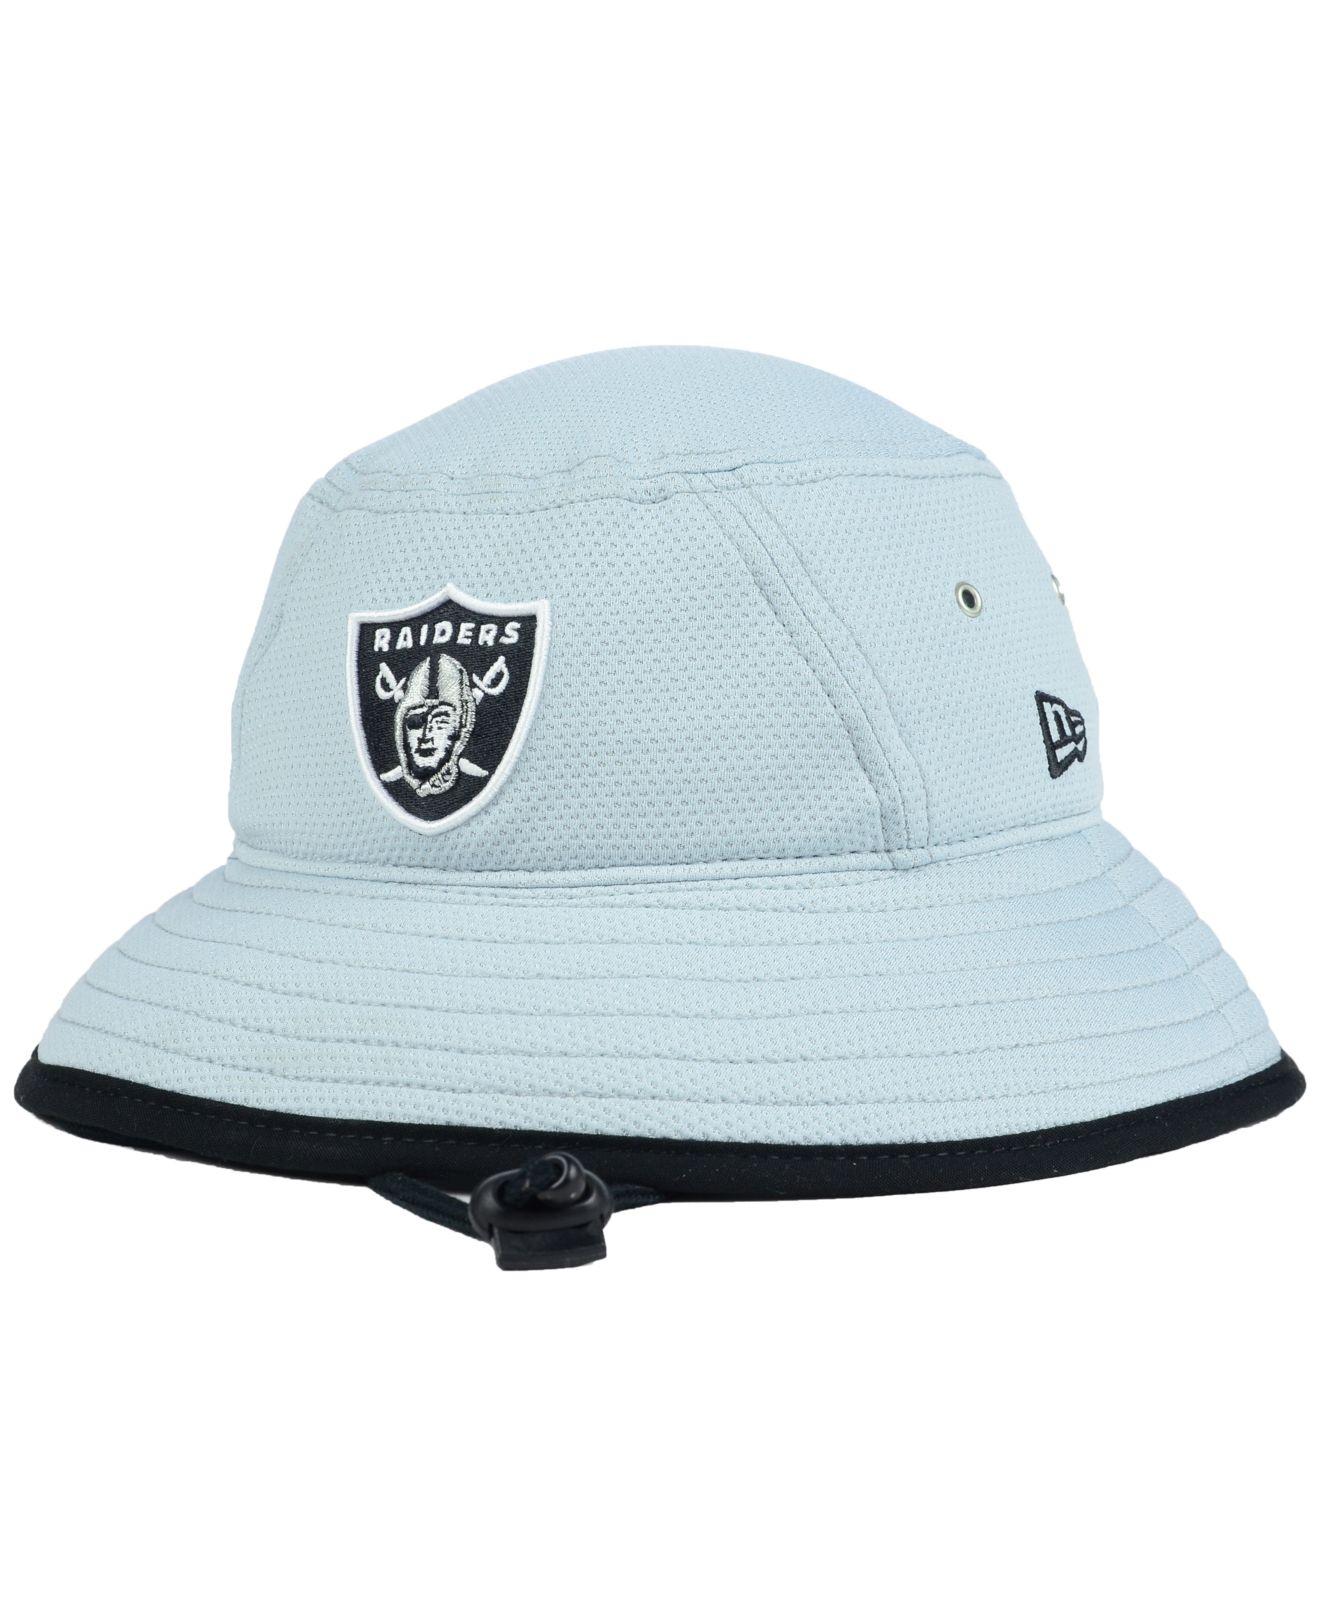 New Era Oakland Raiders Training Straw Hat - Hat HD Image Ukjugs.Org ea0b70385f66